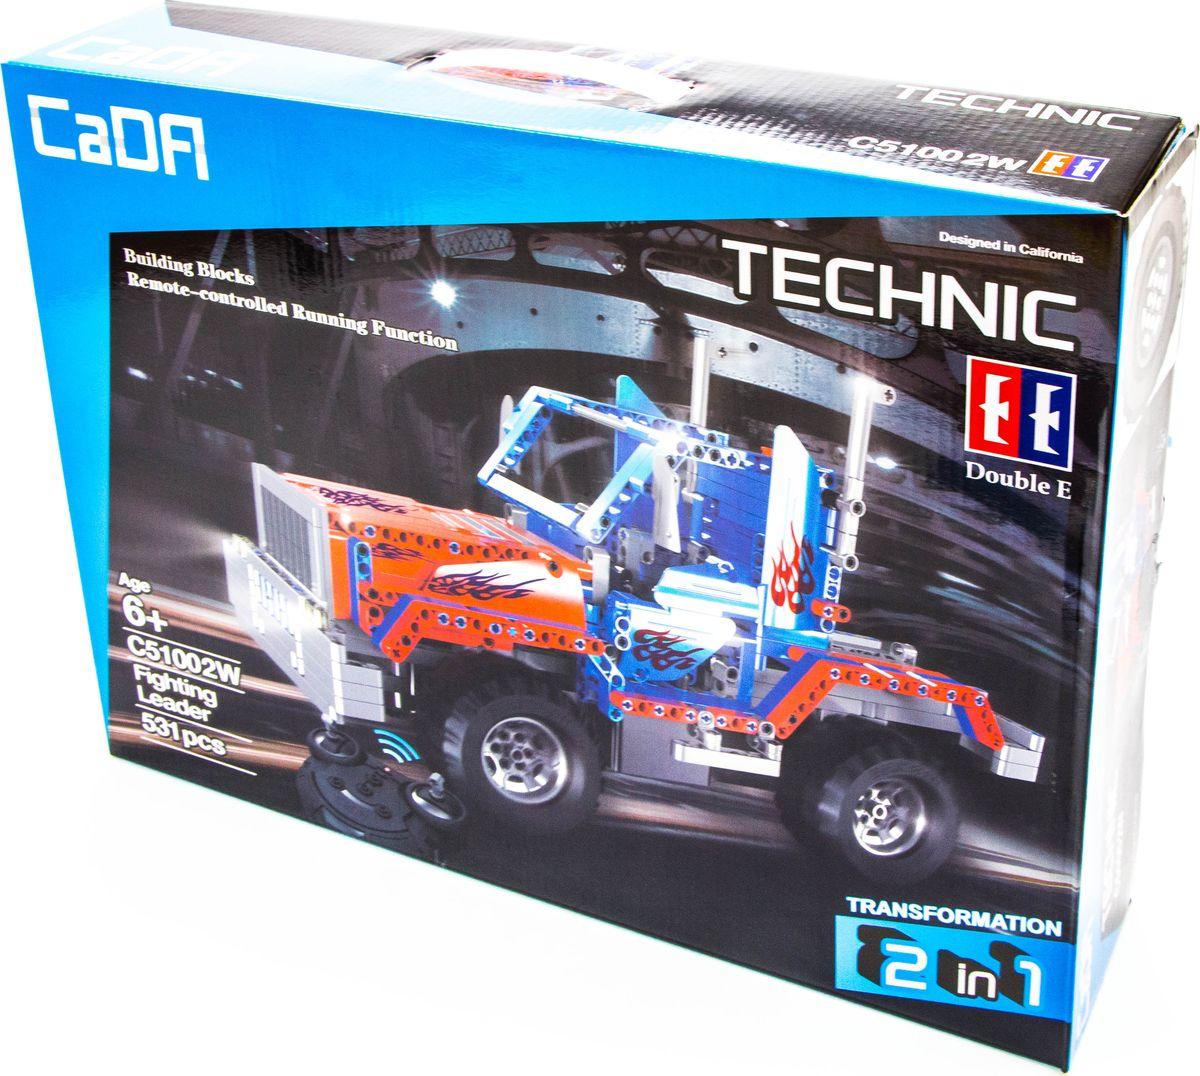 Pilotage Конструктор CaDA Technic Convoy Truck - Конструкторы